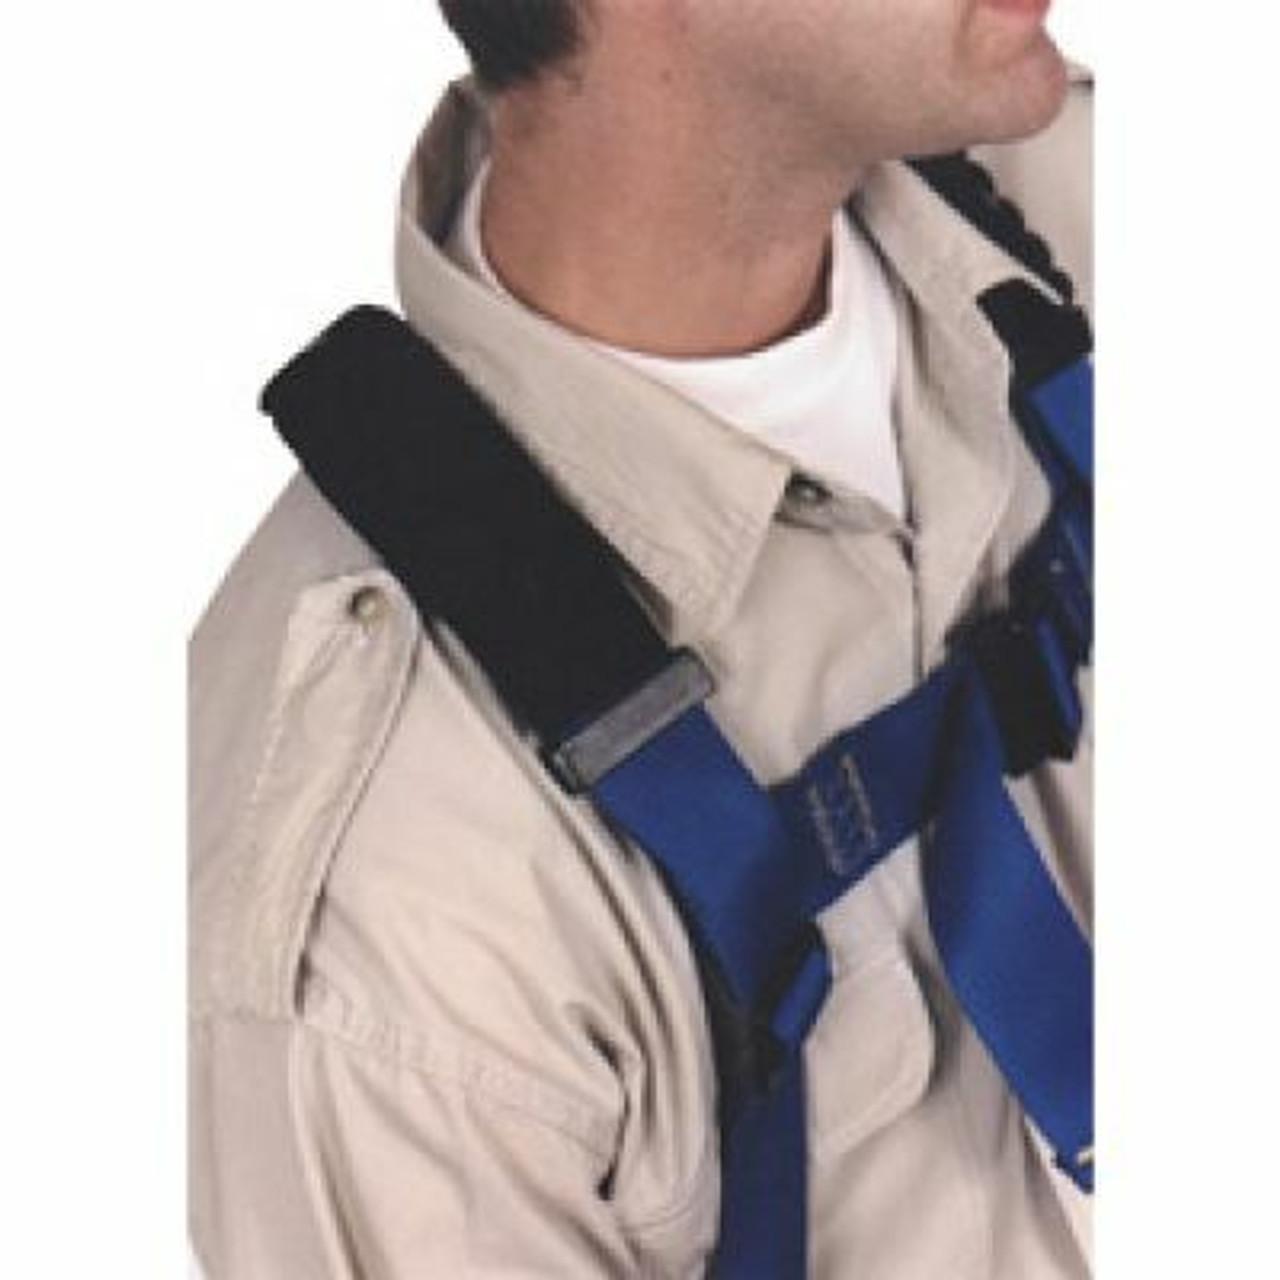 Tractel Xspadw Harness Shoulder Pads